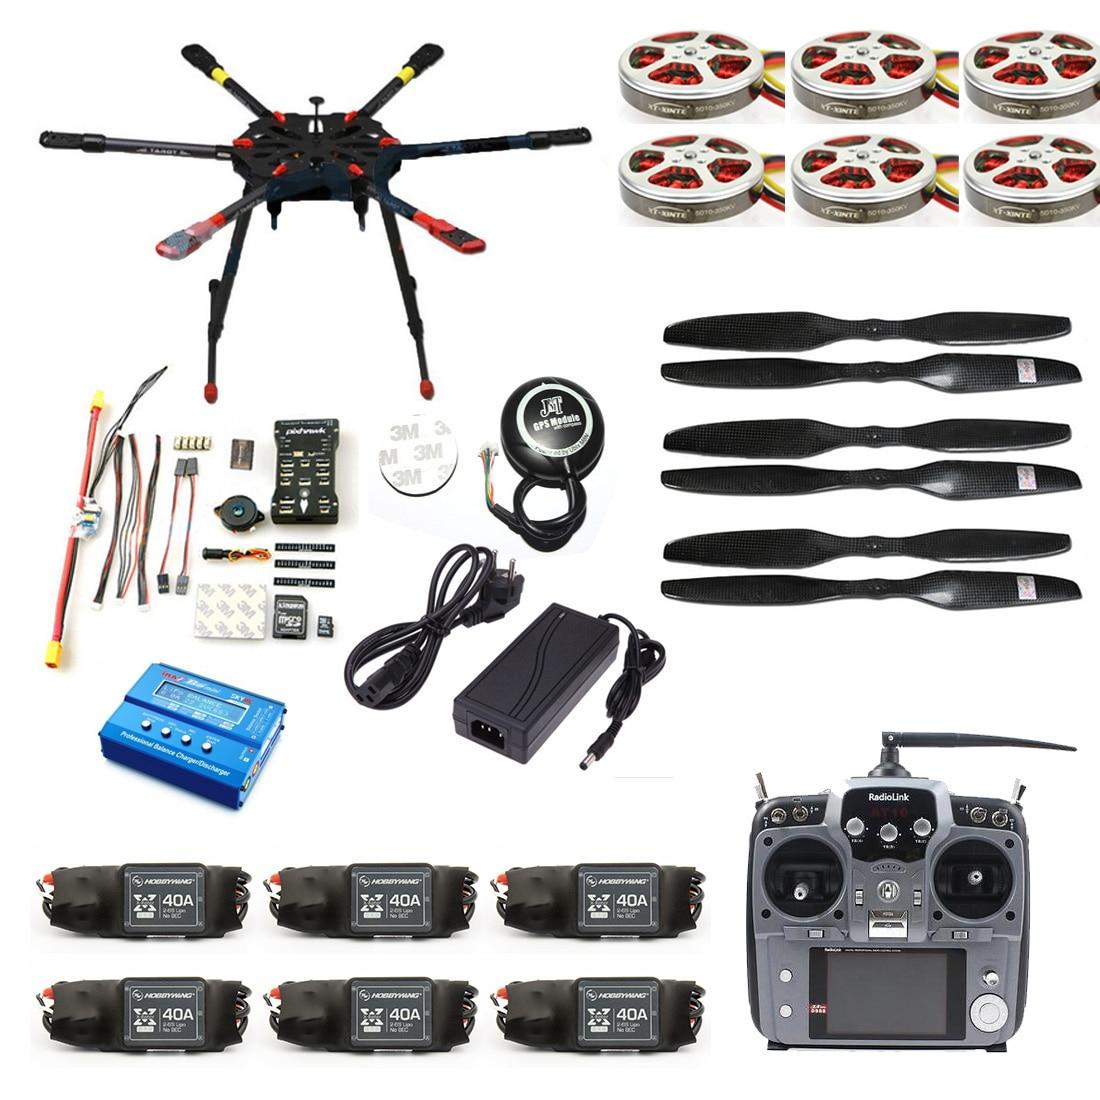 JMT Pro 2.4G 10CH 960mm Tarot X6 Dobrável Retrátil PIX M8N PX4 GPS ARF/Kit DIY RC Hexacopter Zangão Unassembly FNP F11283-A/B